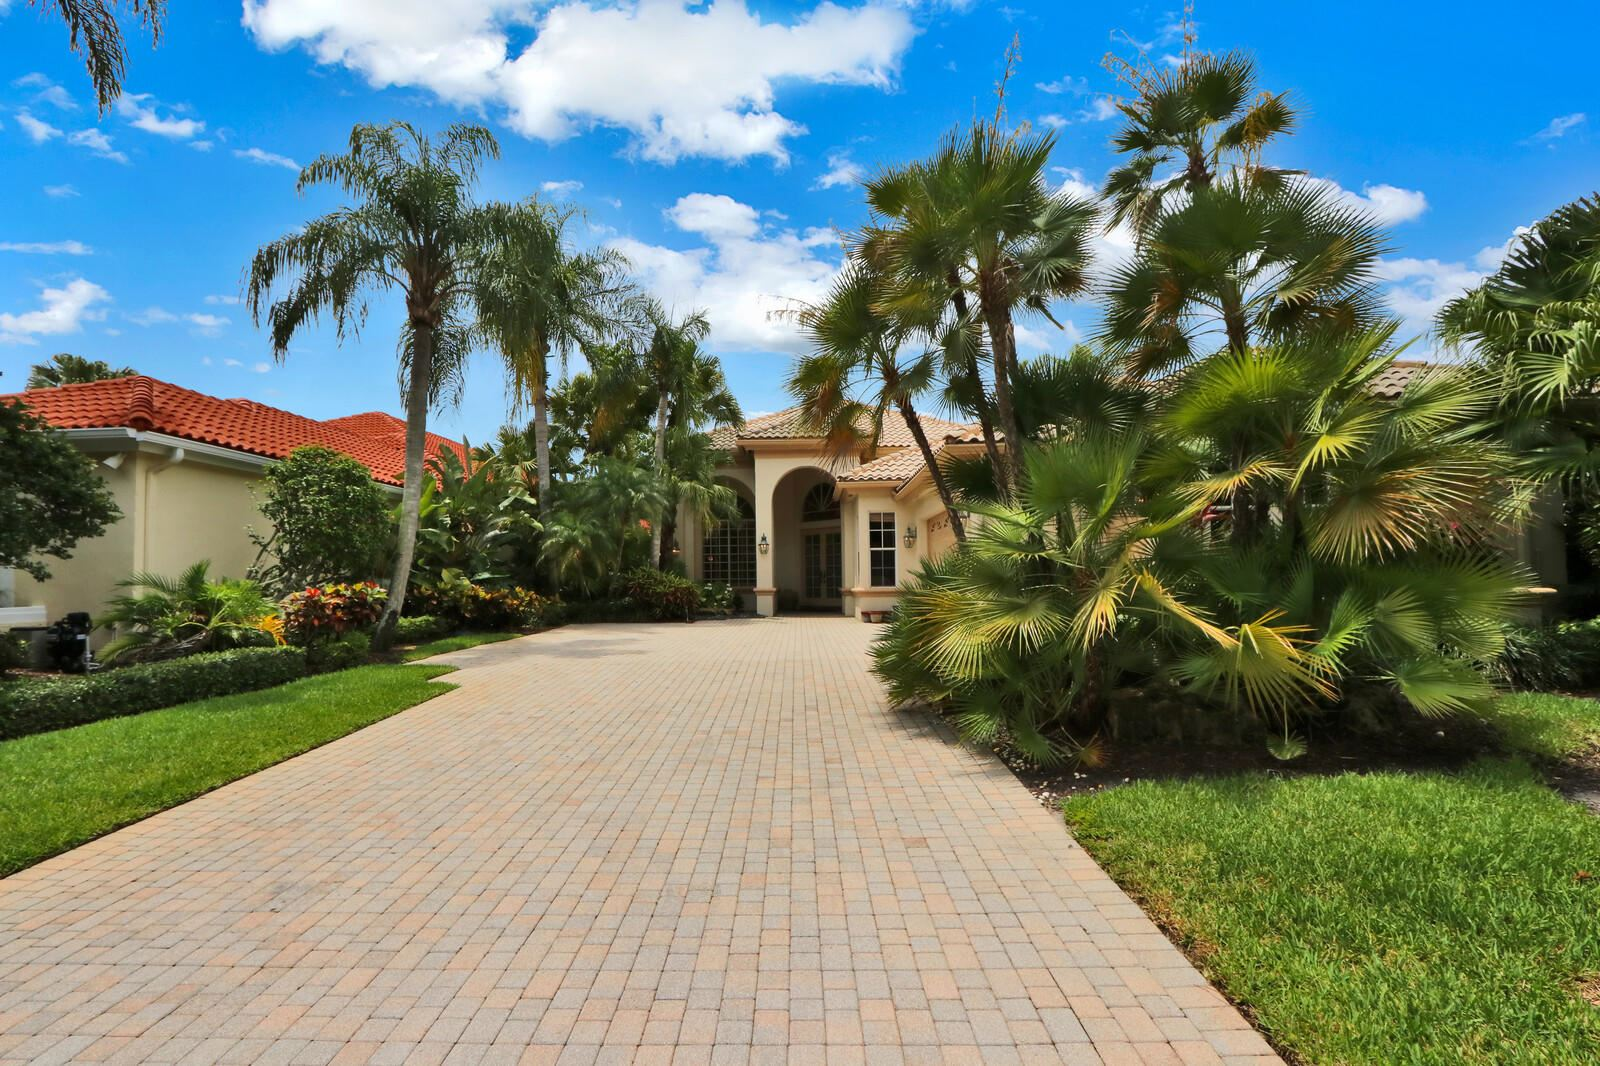 Photo of 3338 W Degas Drive, Palm Beach Gardens, FL 33410 (MLS # RX-10624807)